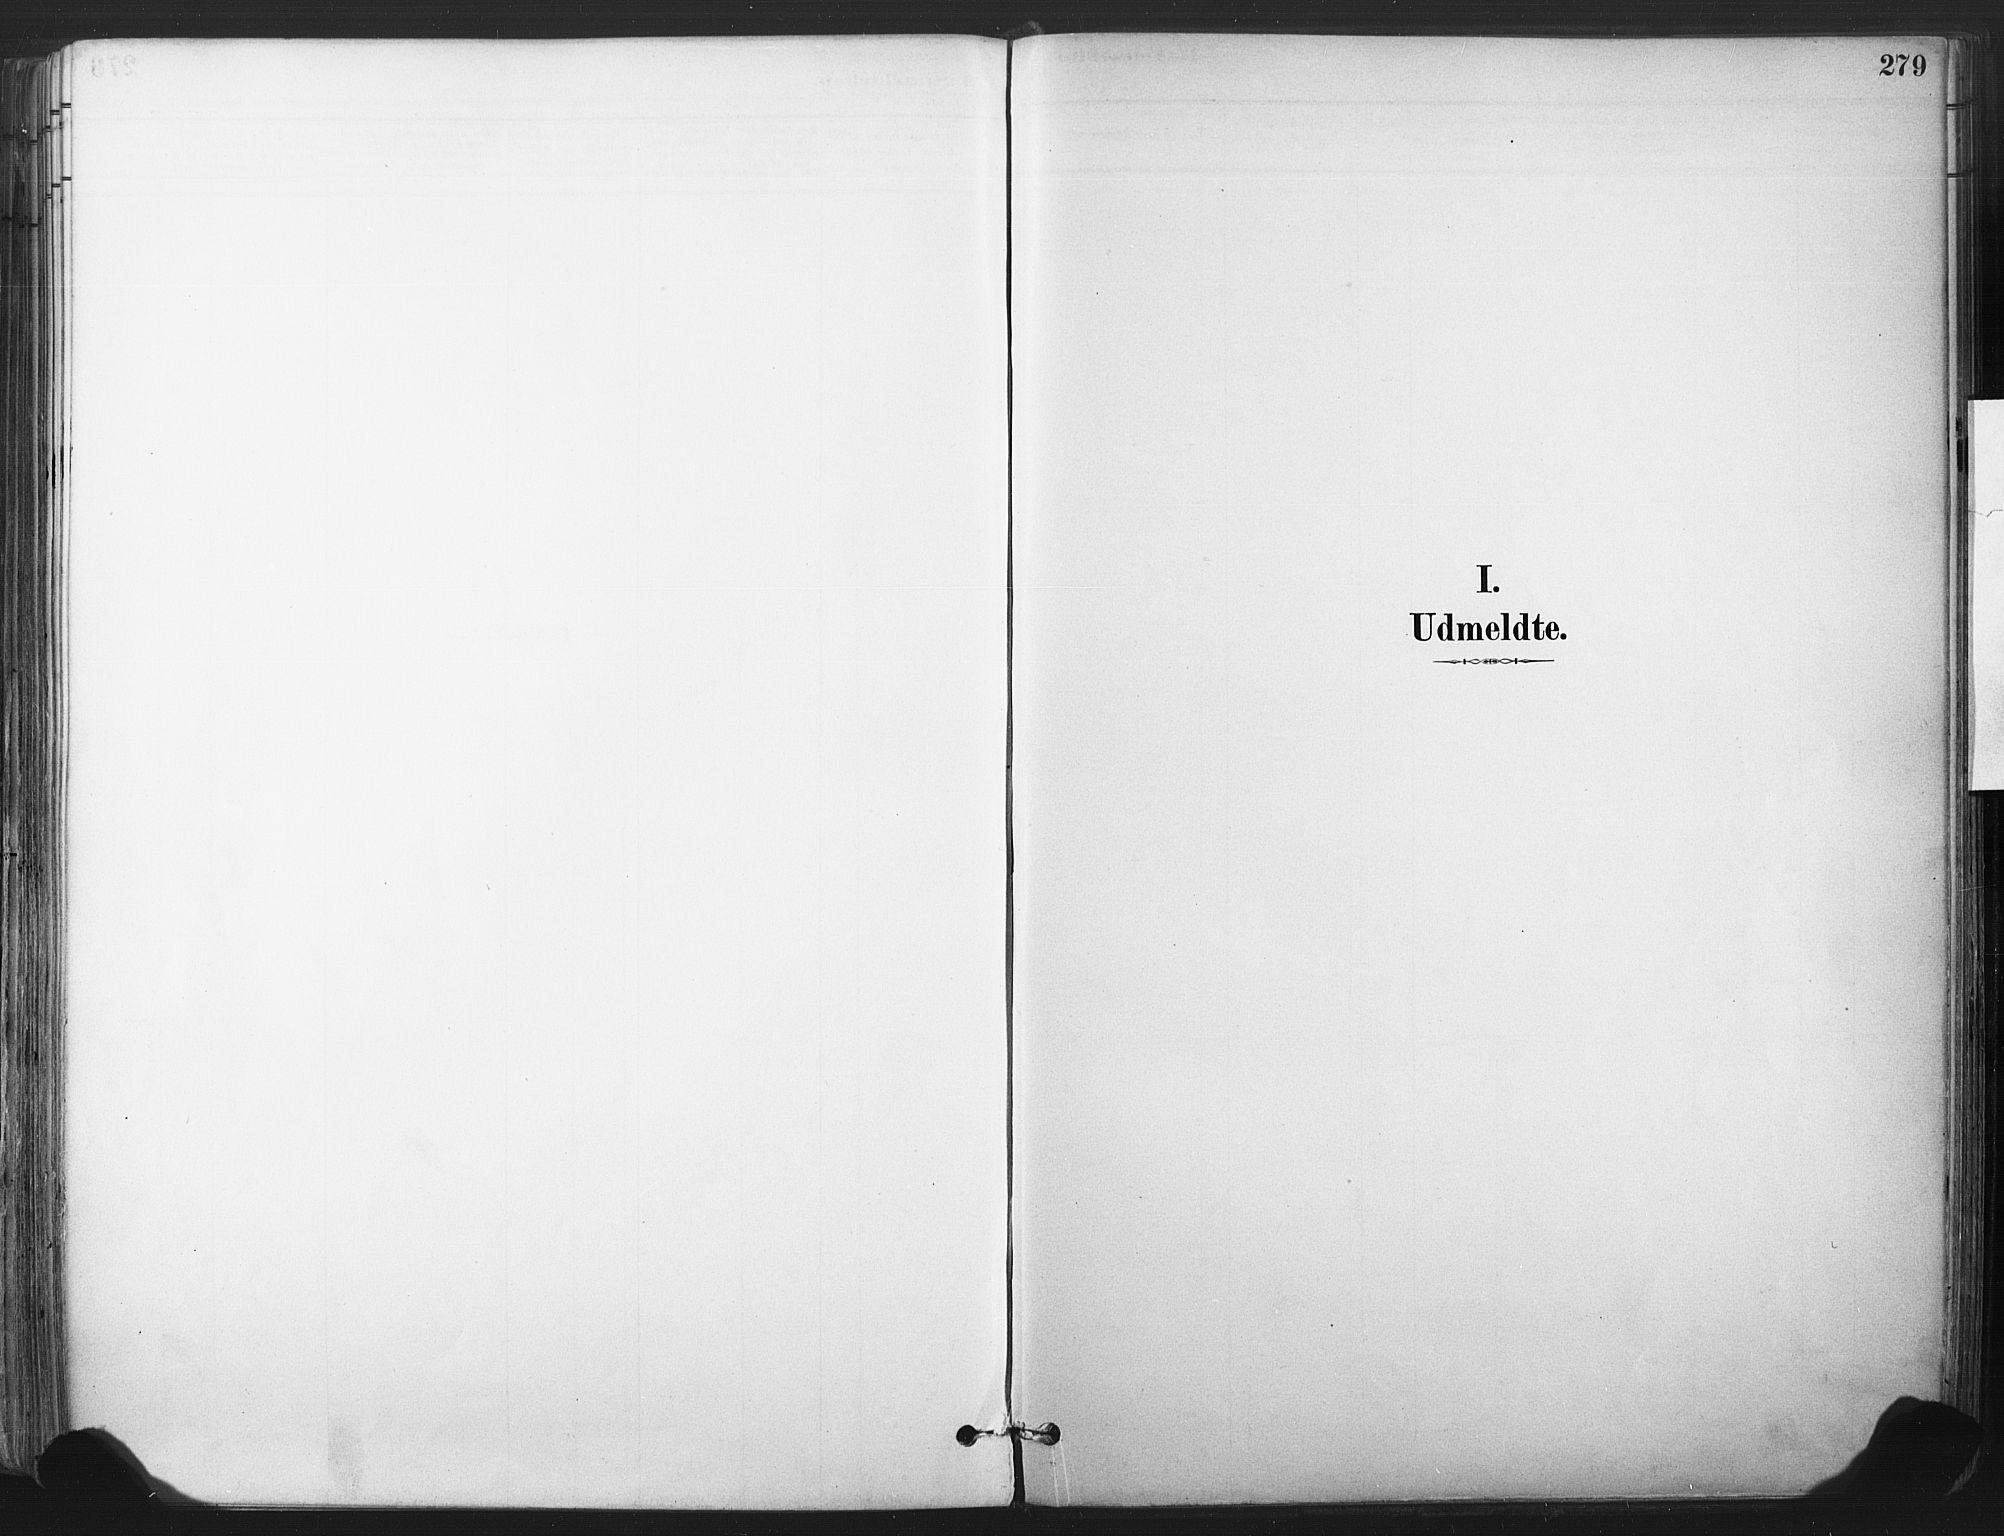 SAKO, Larvik kirkebøker, F/Fa/L0010: Ministerialbok nr. I 10, 1884-1910, s. 279